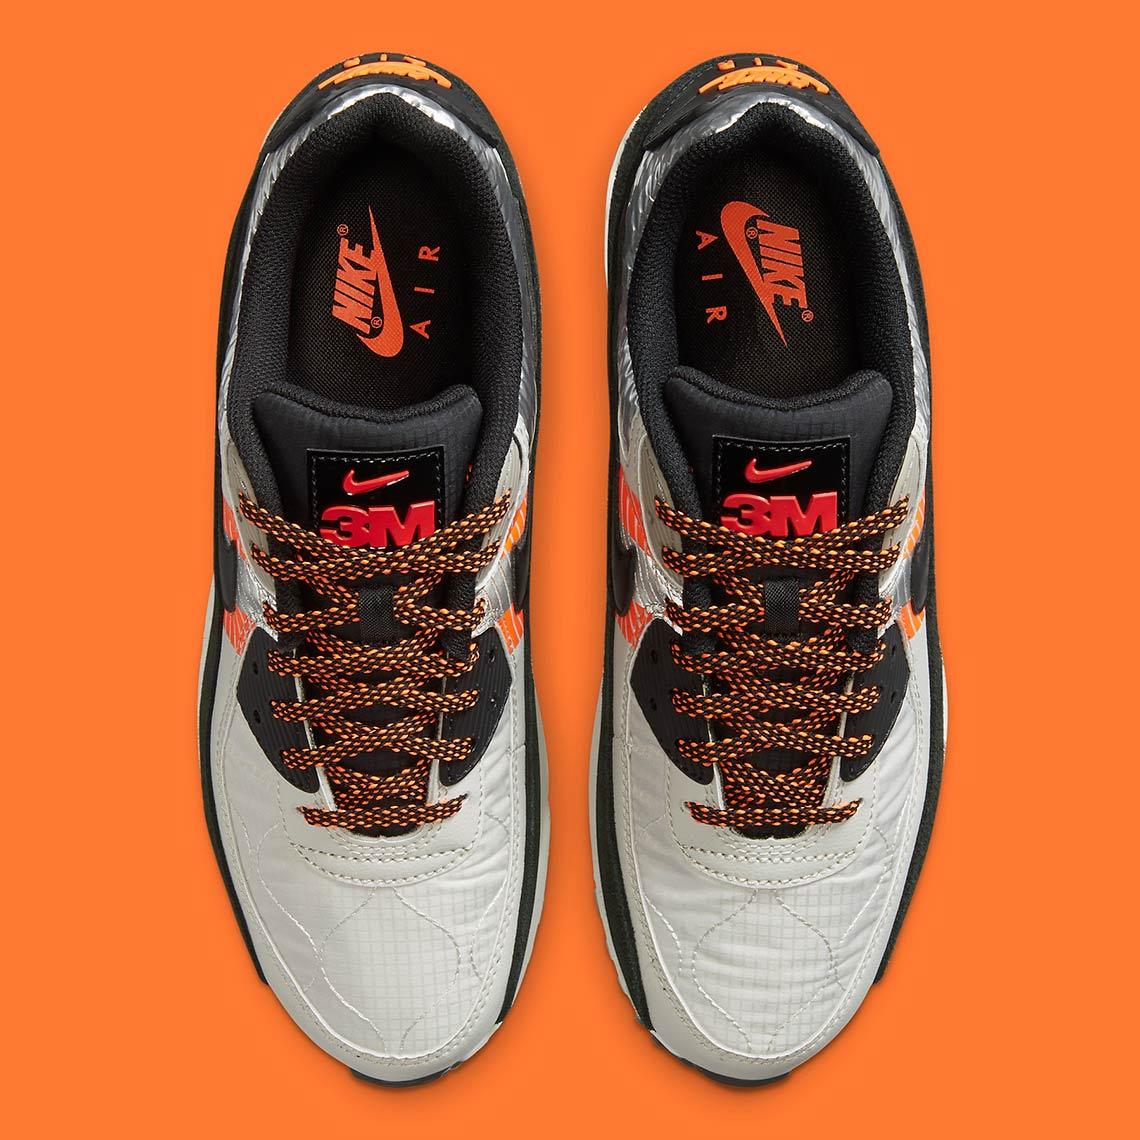 3M Nike Air Max 90 CZ2975-001 Release Info   SneakerNews.com